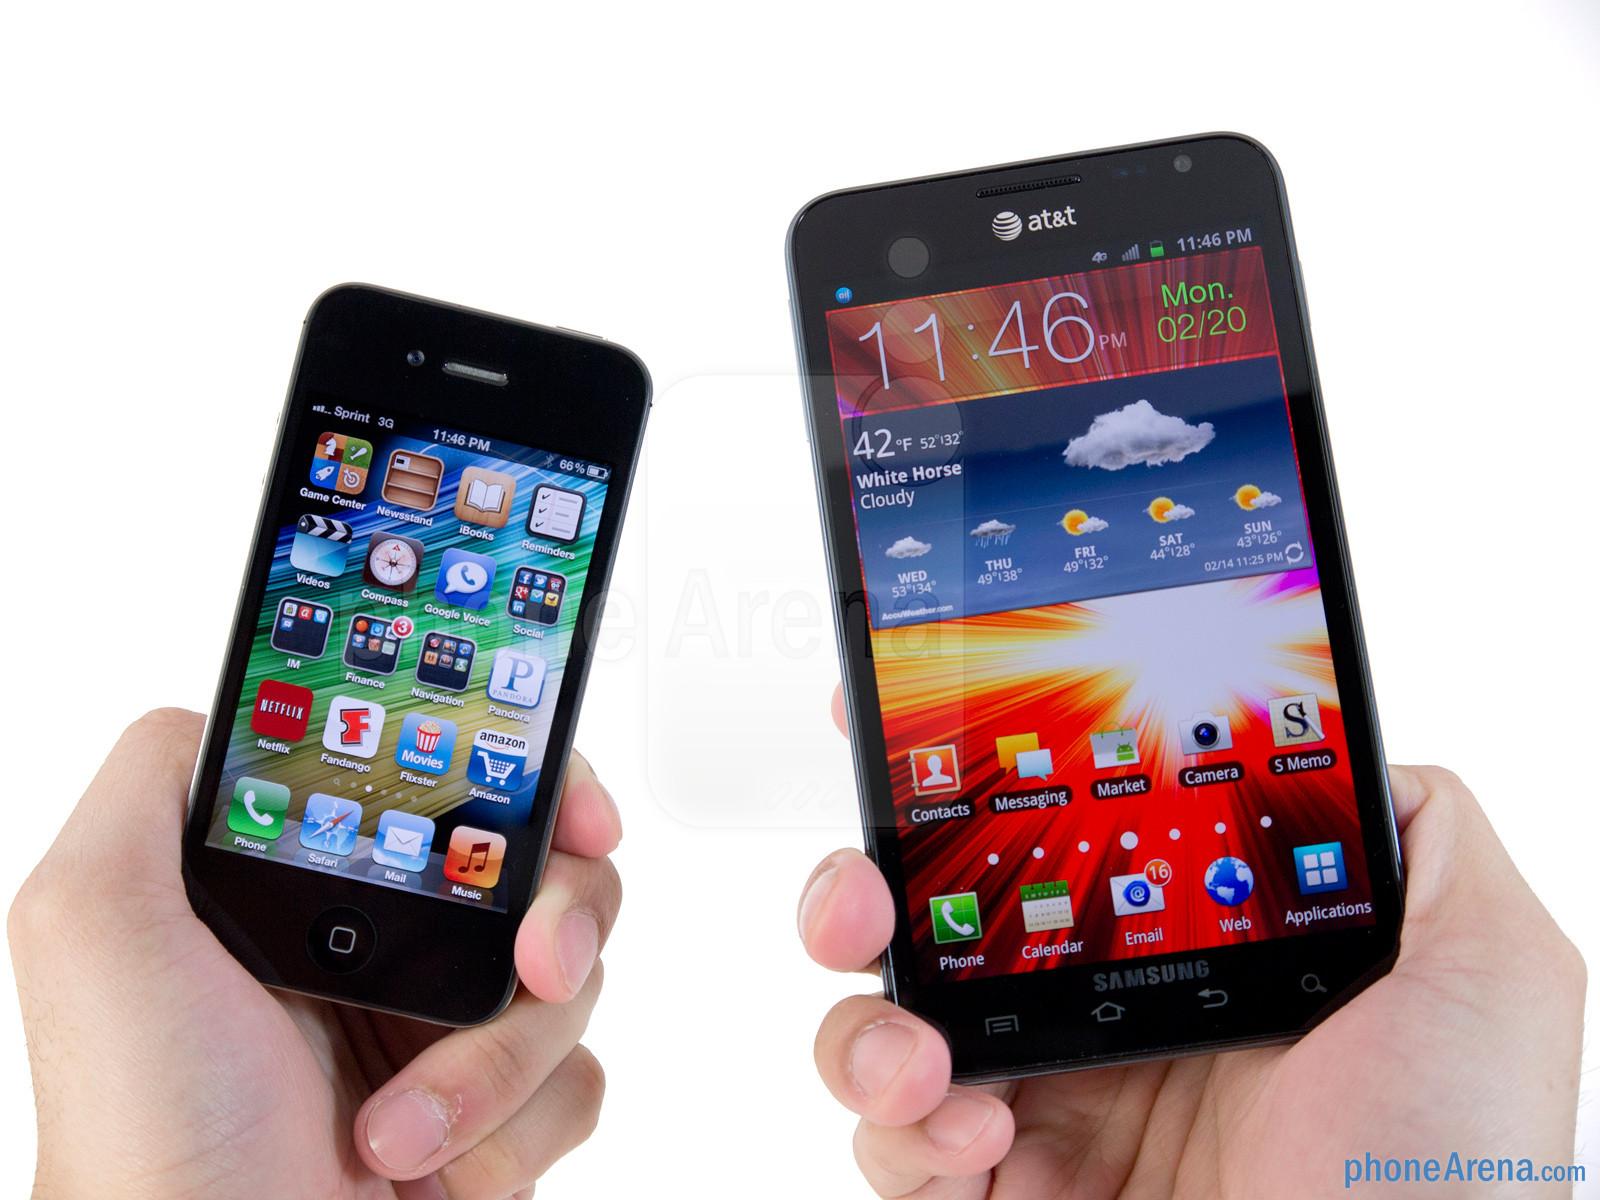 Samsung-Galaxy-Note-LTE-vs-Apple-iPhone-4S-Design-19